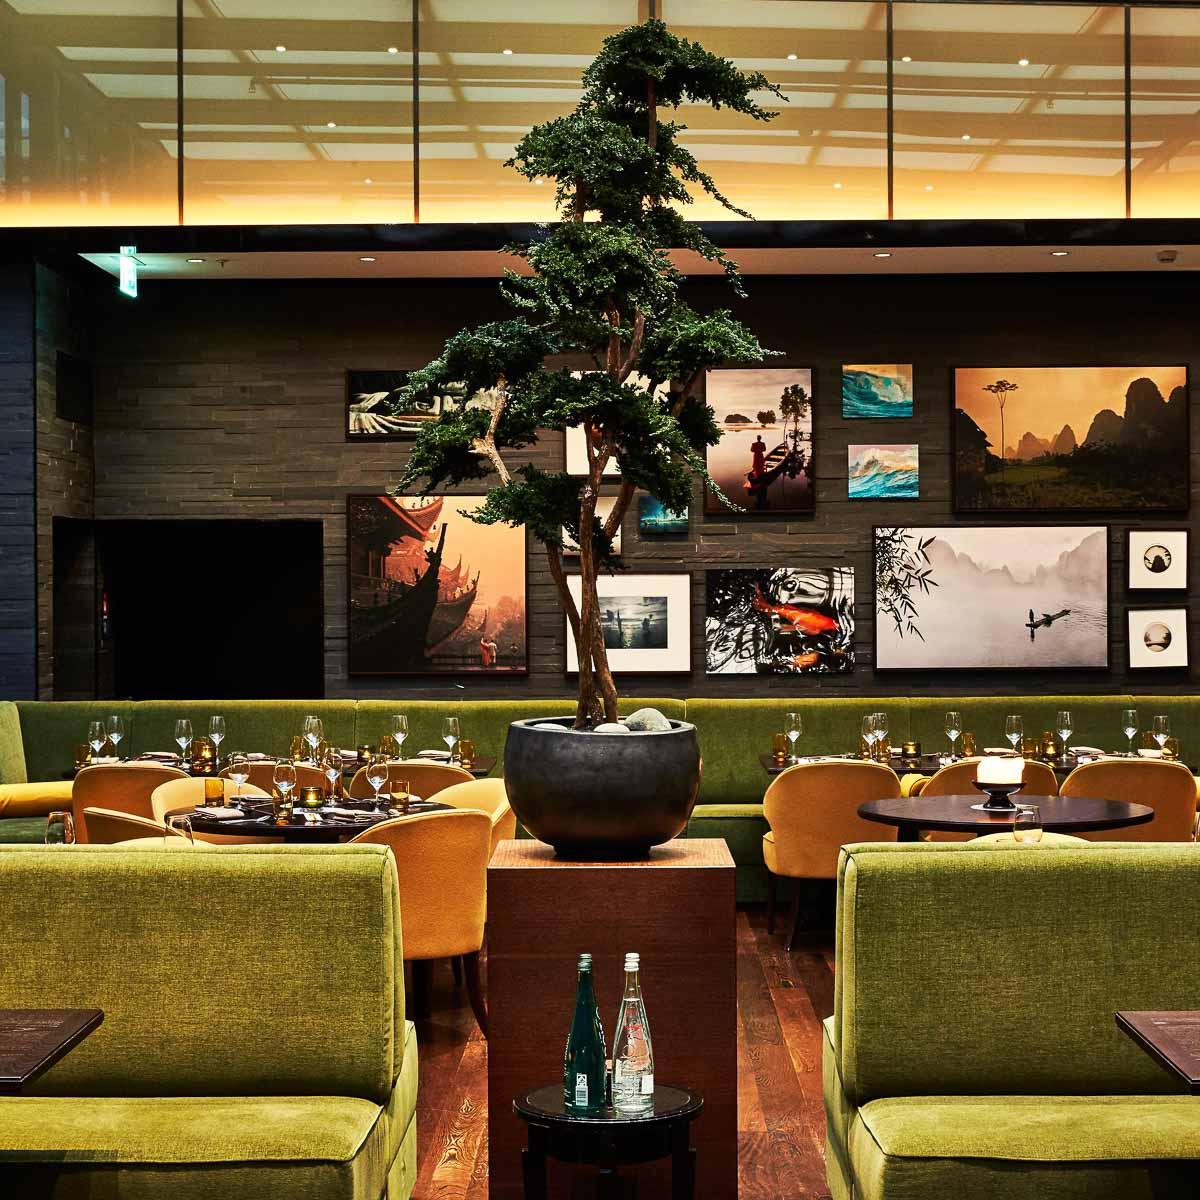 Restaurant Sra Bua im Hotel Adlon